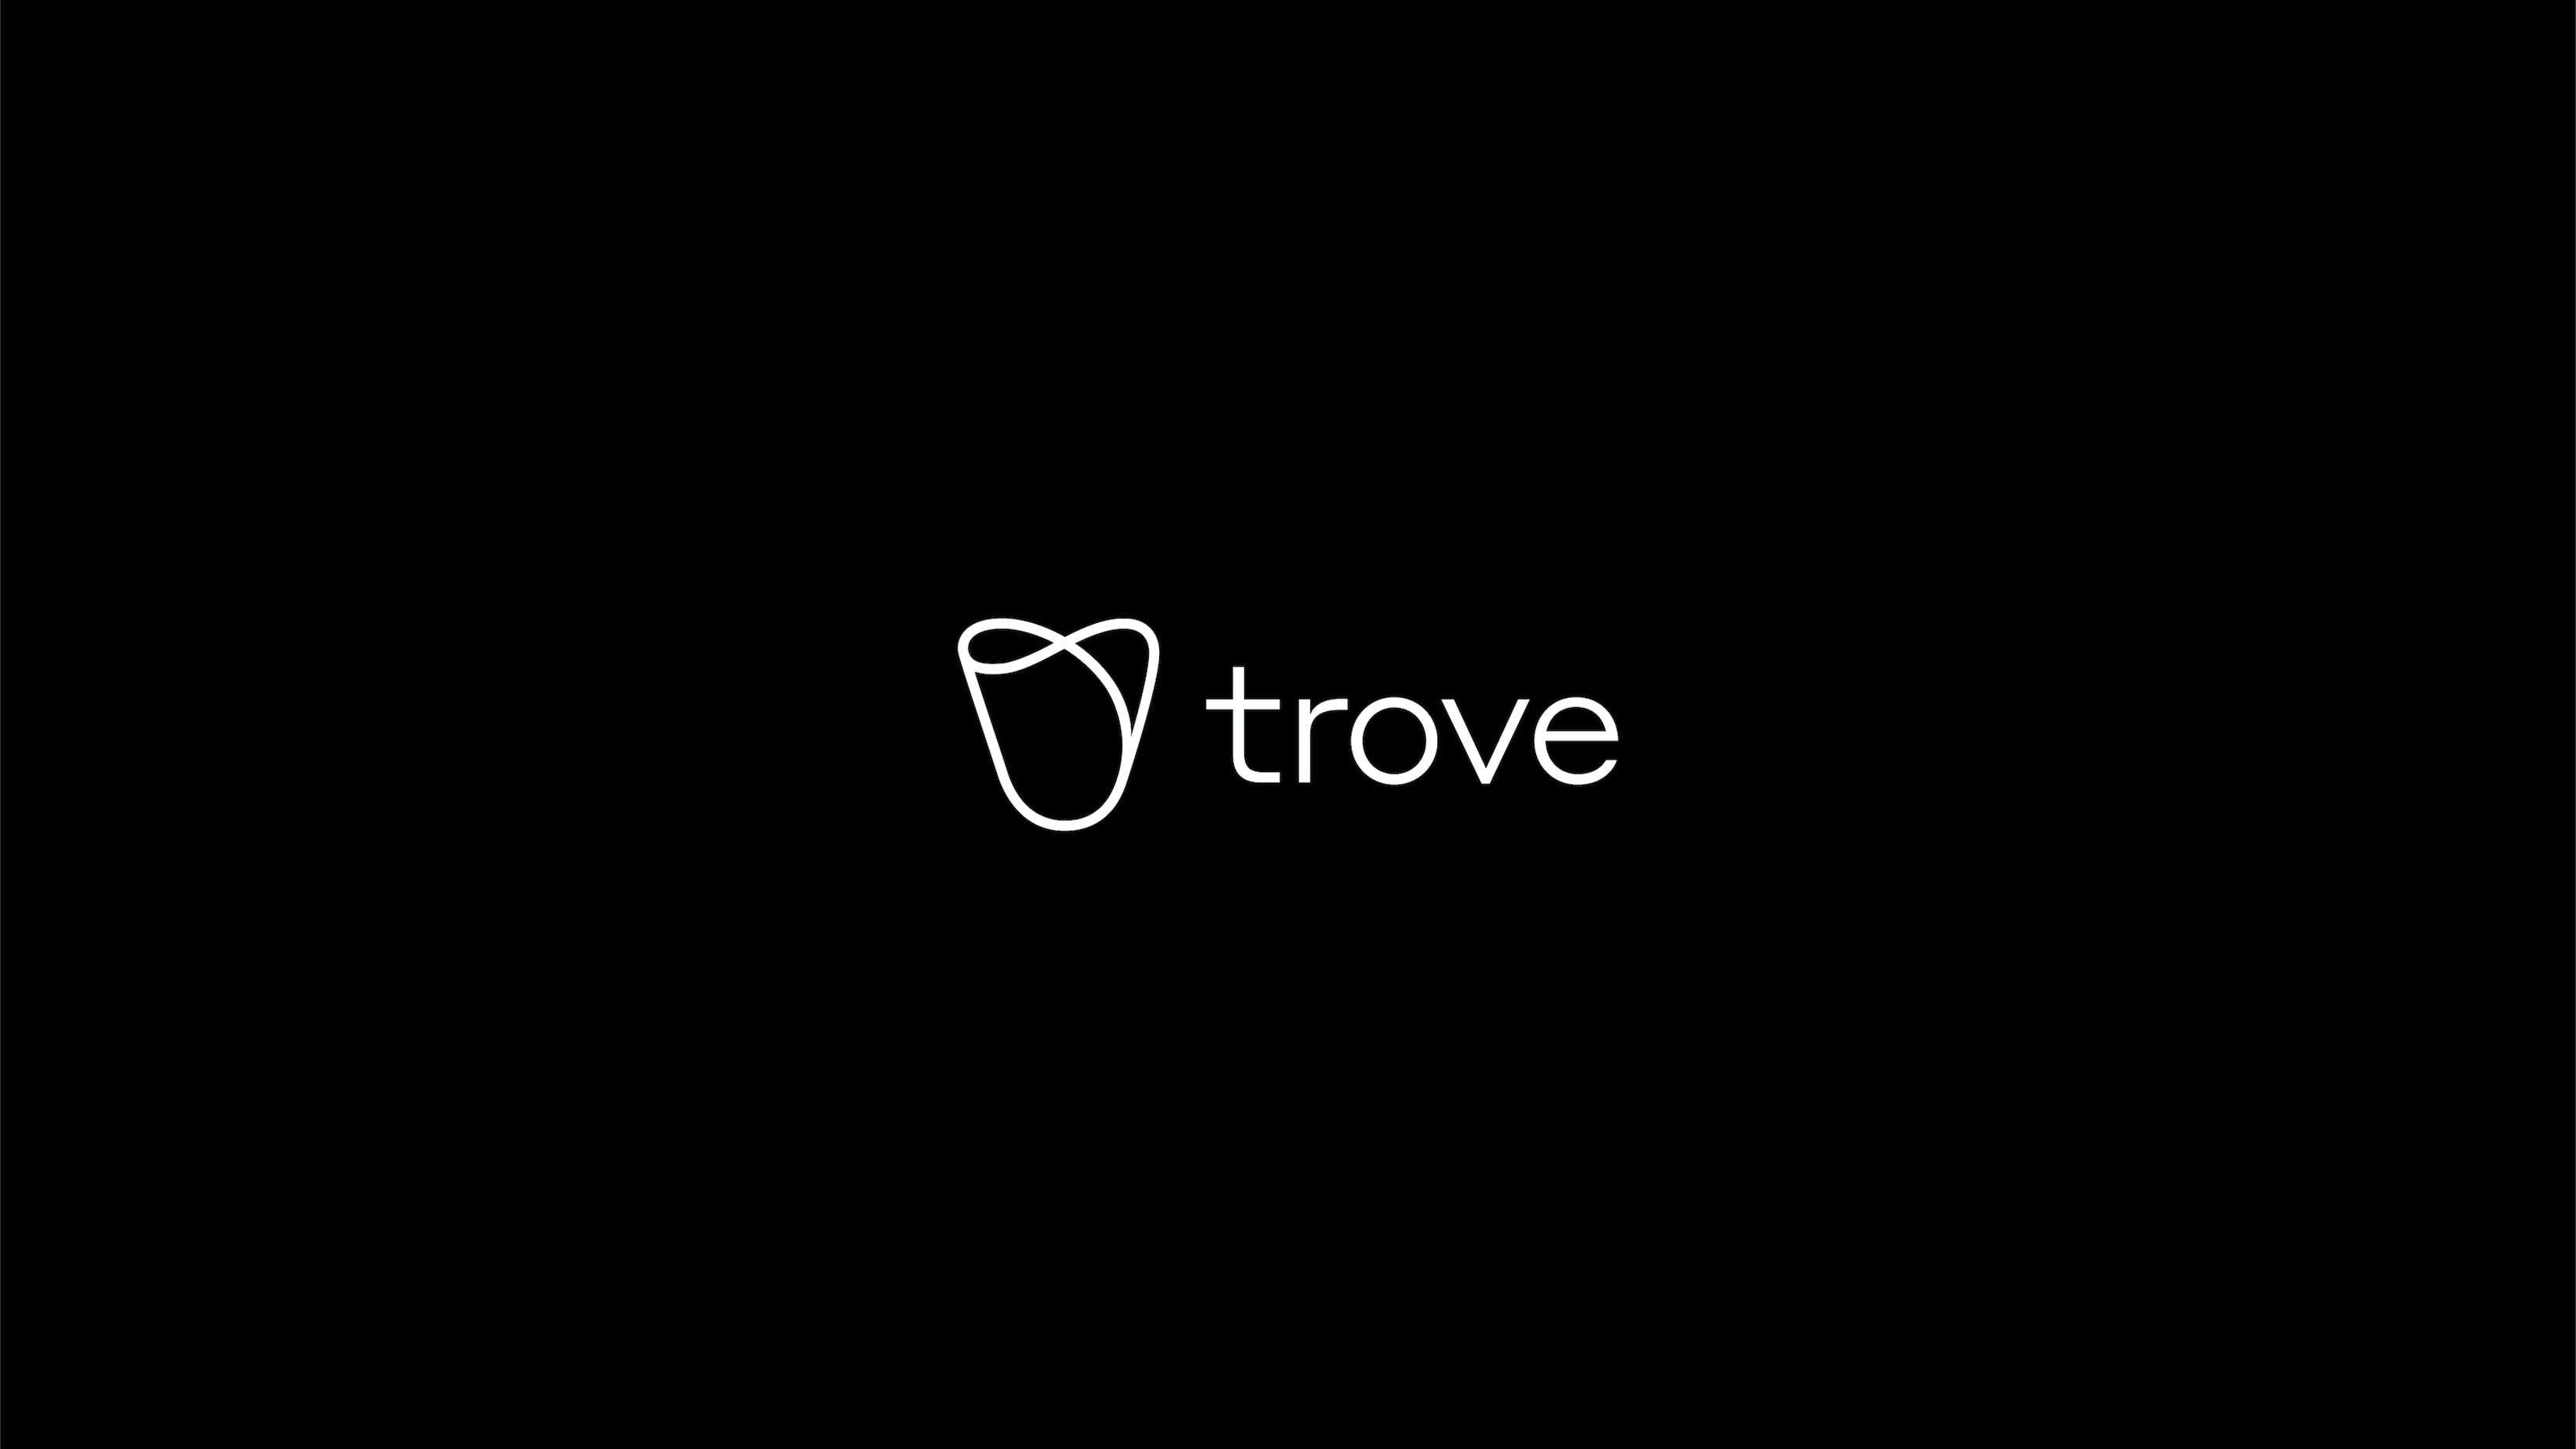 Trove Play In 2021 Logos Brand Identity